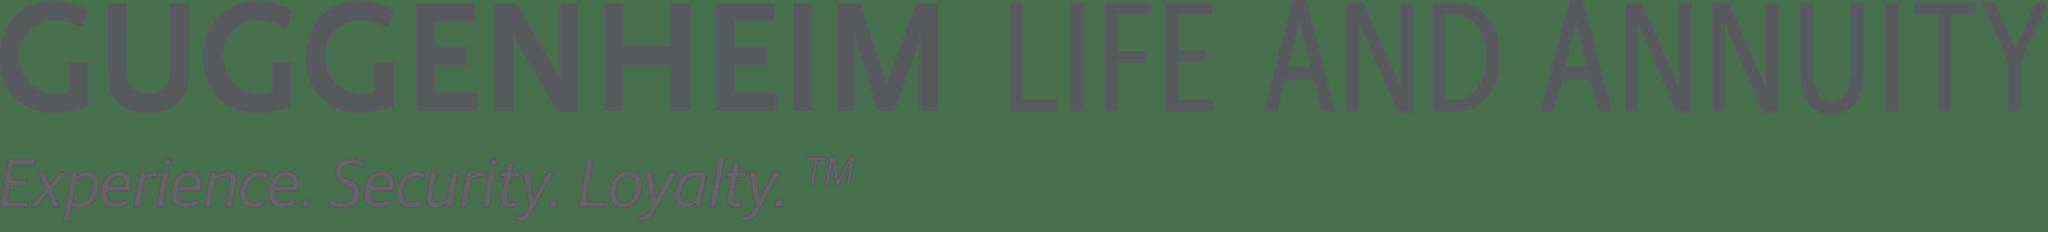 https://retirementrealizedfinancial.com/wp-content/uploads/sites/185/2020/08/Header-Logo-Lockup_2.png